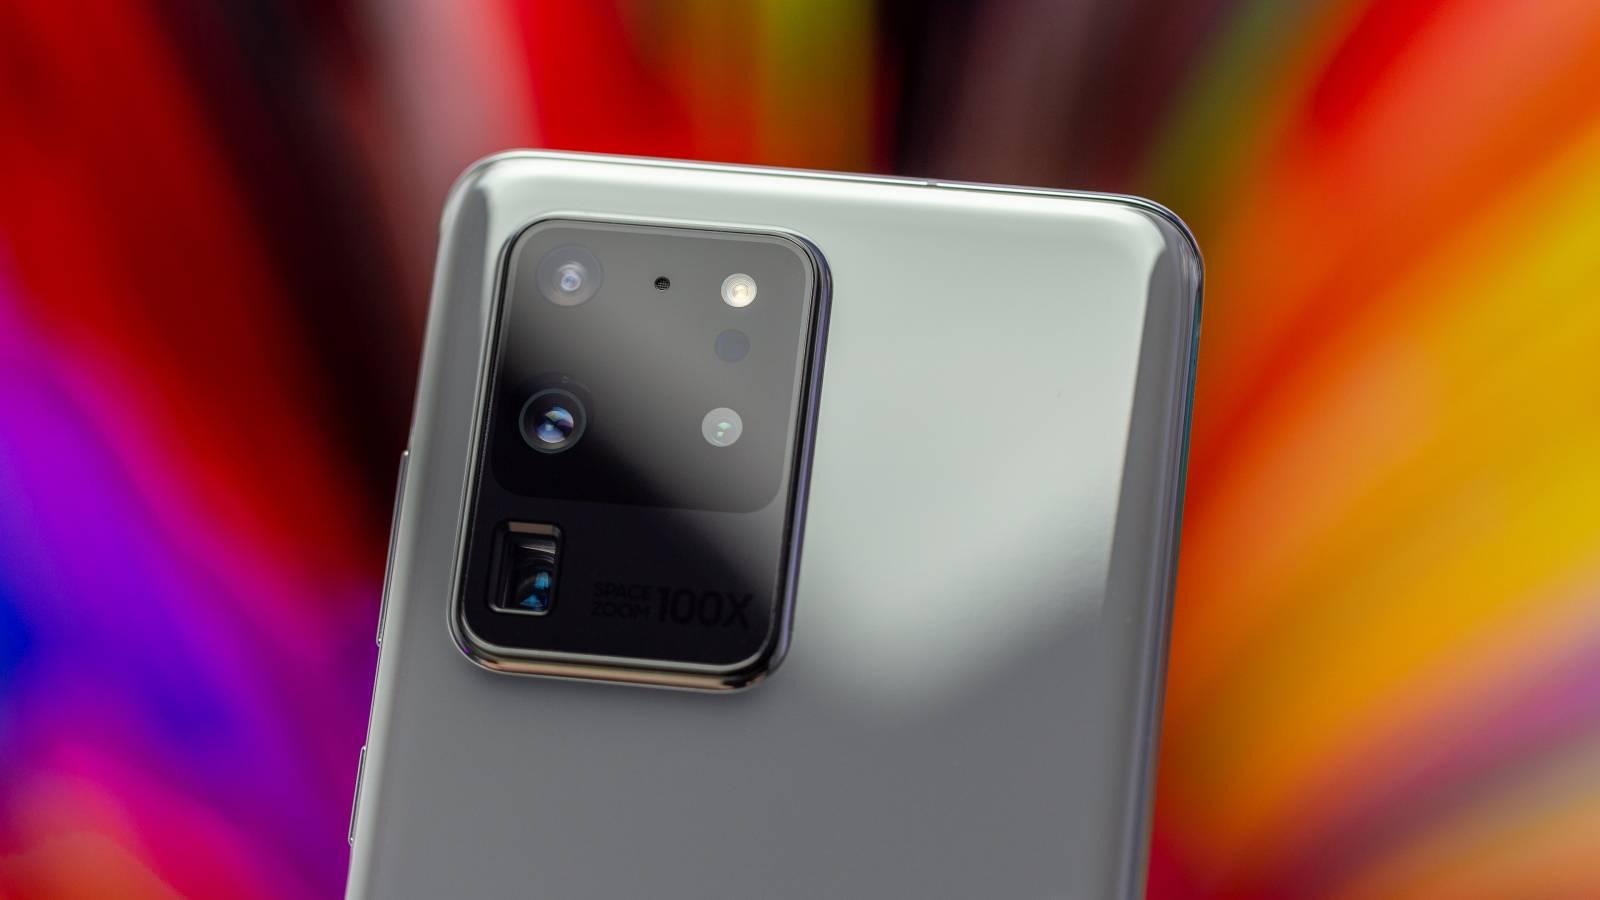 emag Samsung GALAXY S20 oferte speciale limitate